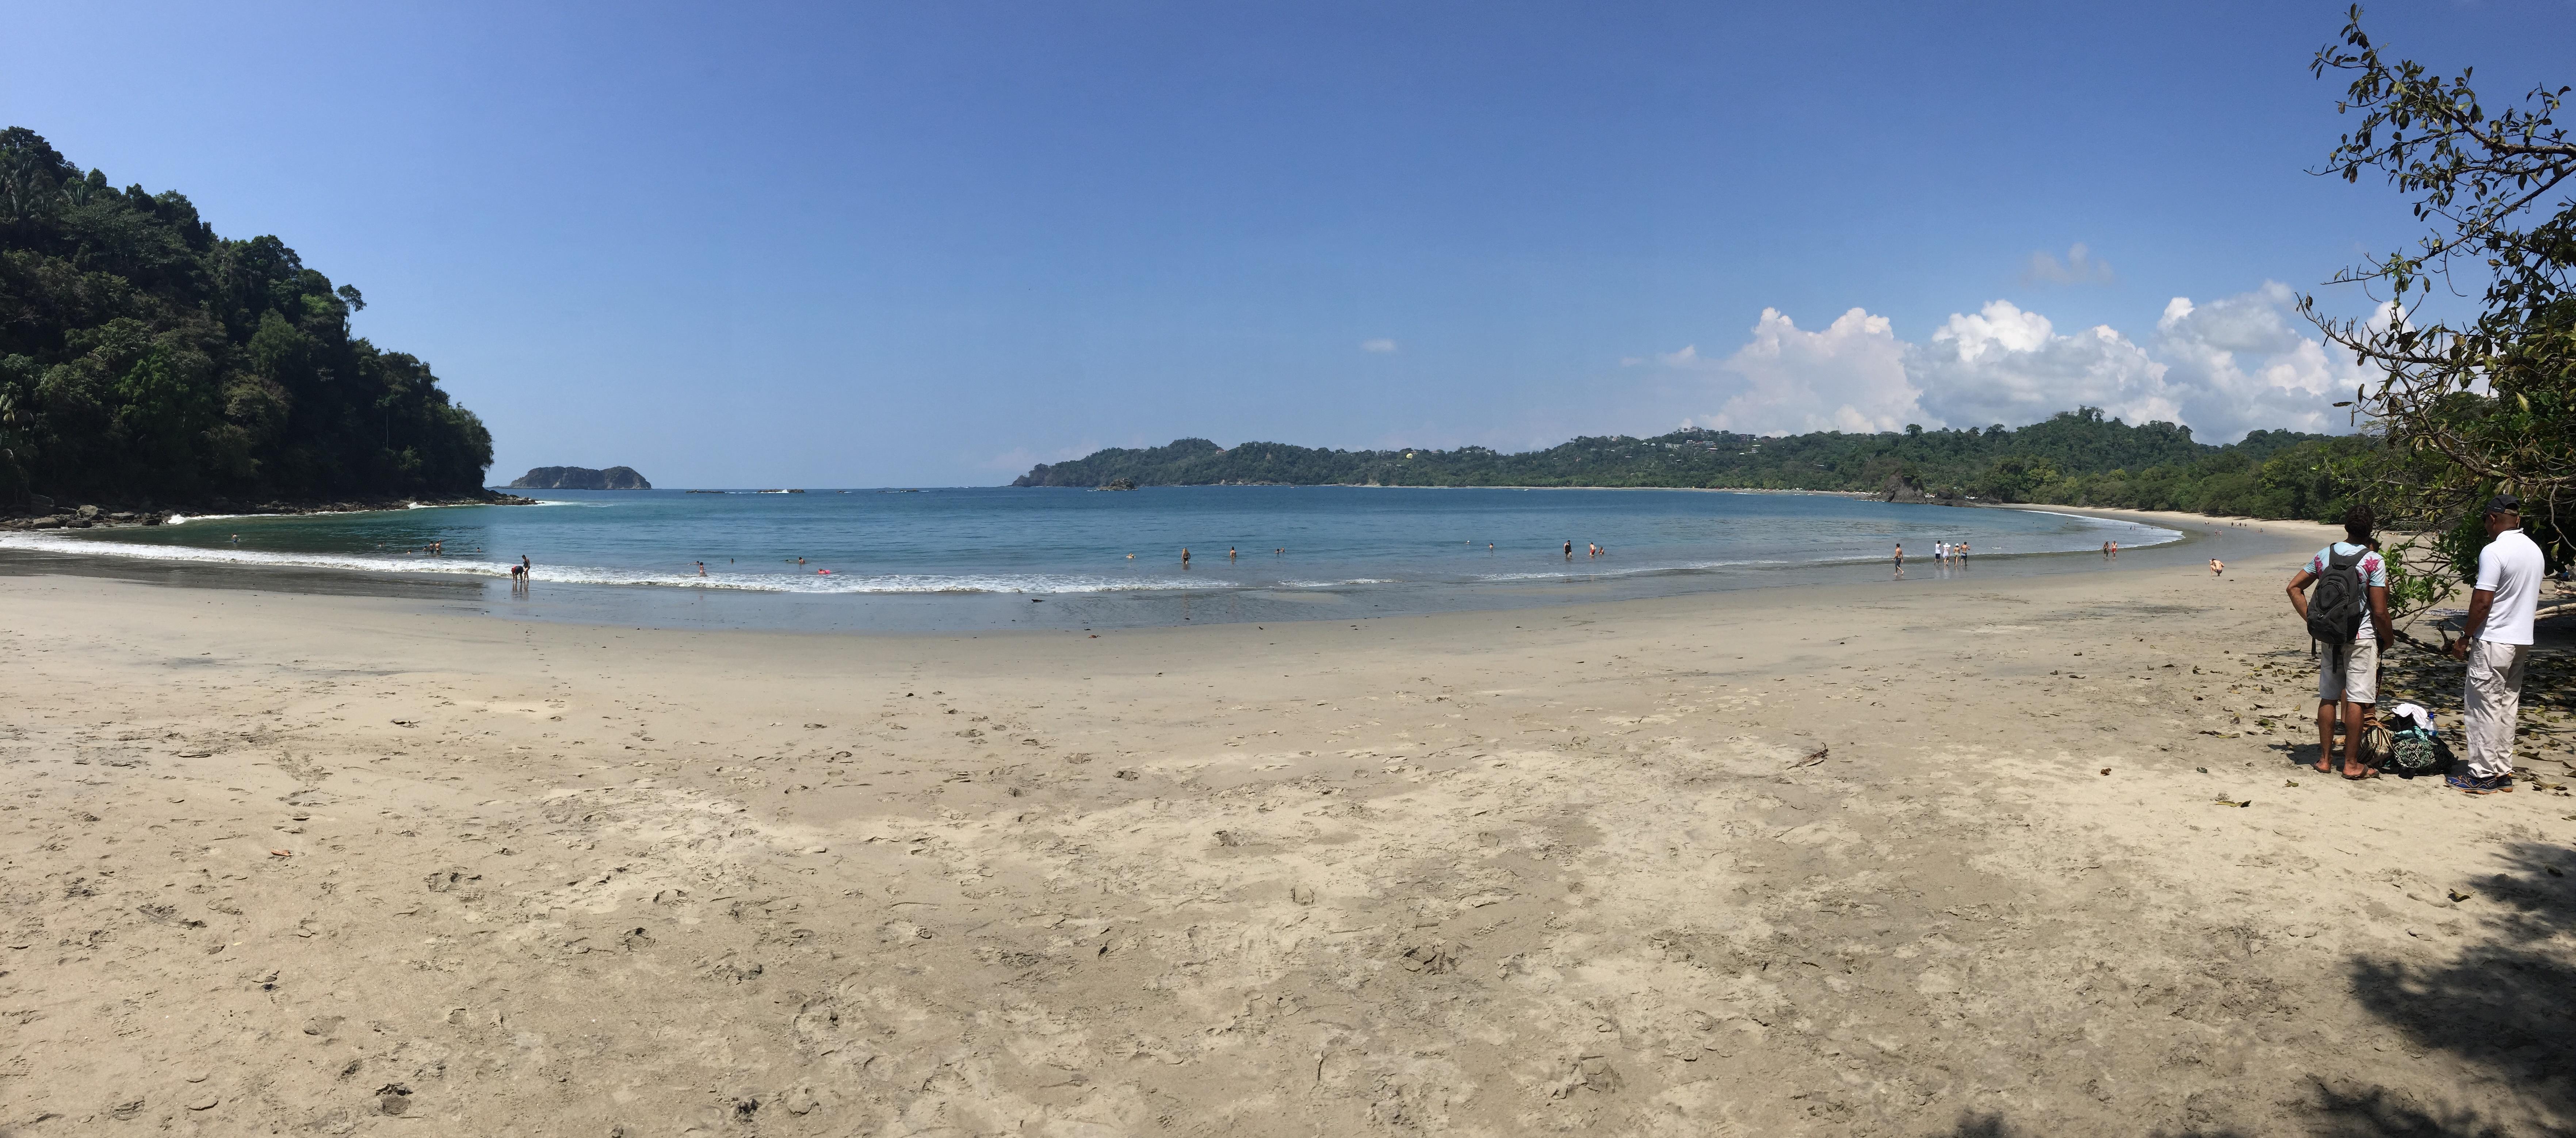 Playa Manuel Antonio